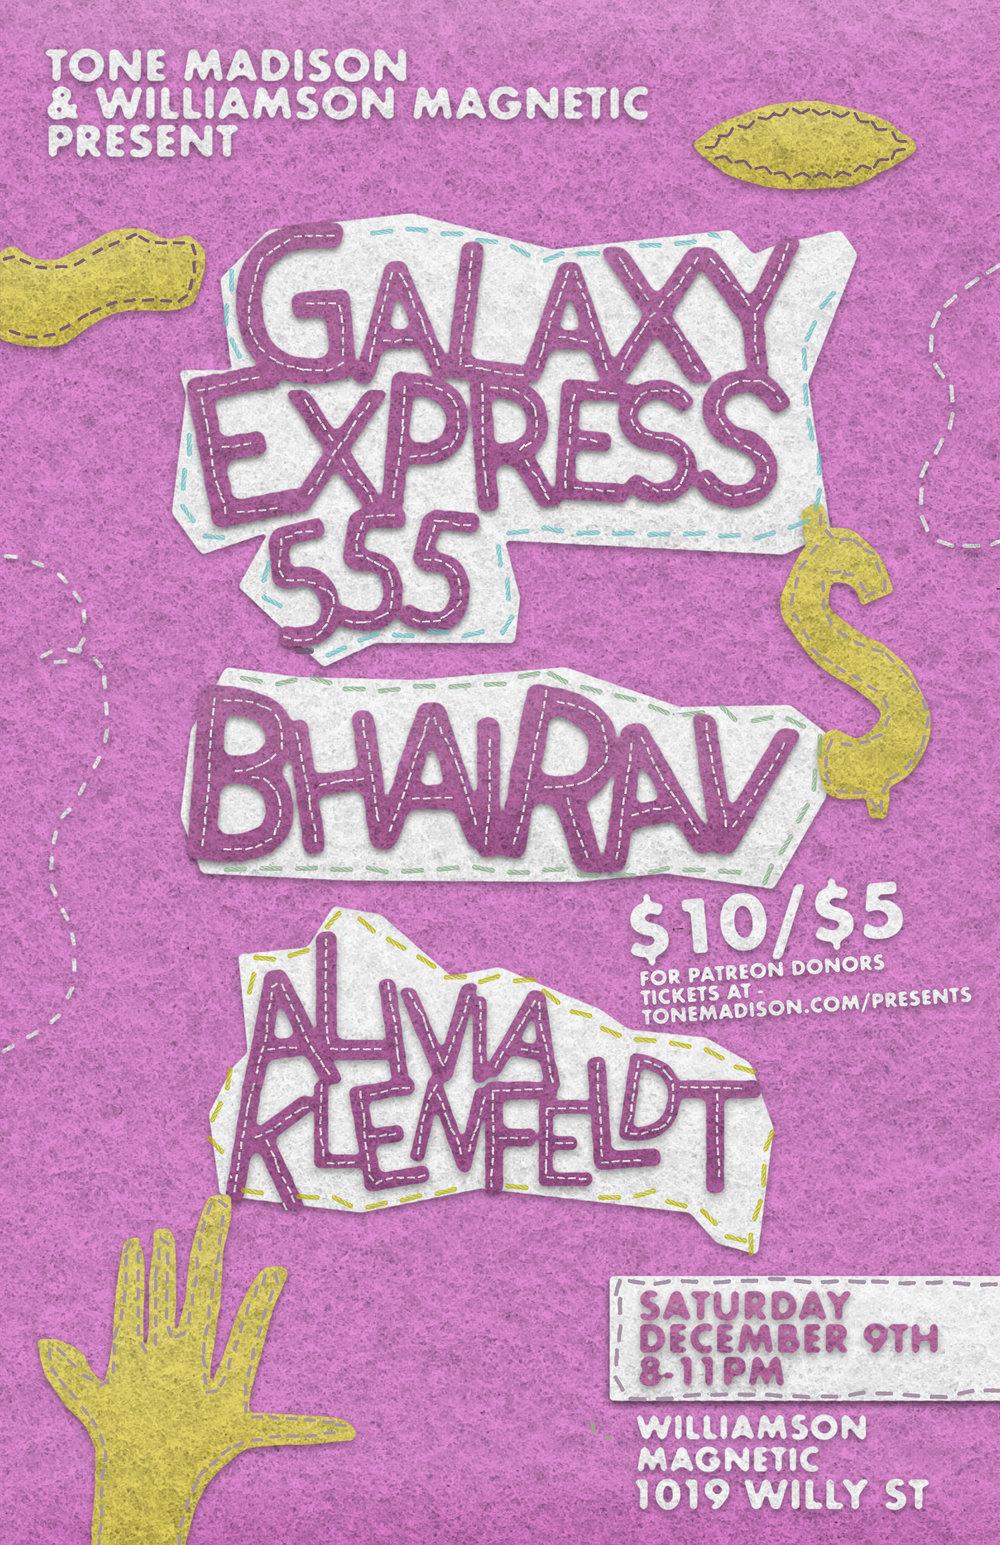 12/9/2017: Galaxy Express 555, Bhairav, Alivia Kleinfeldt